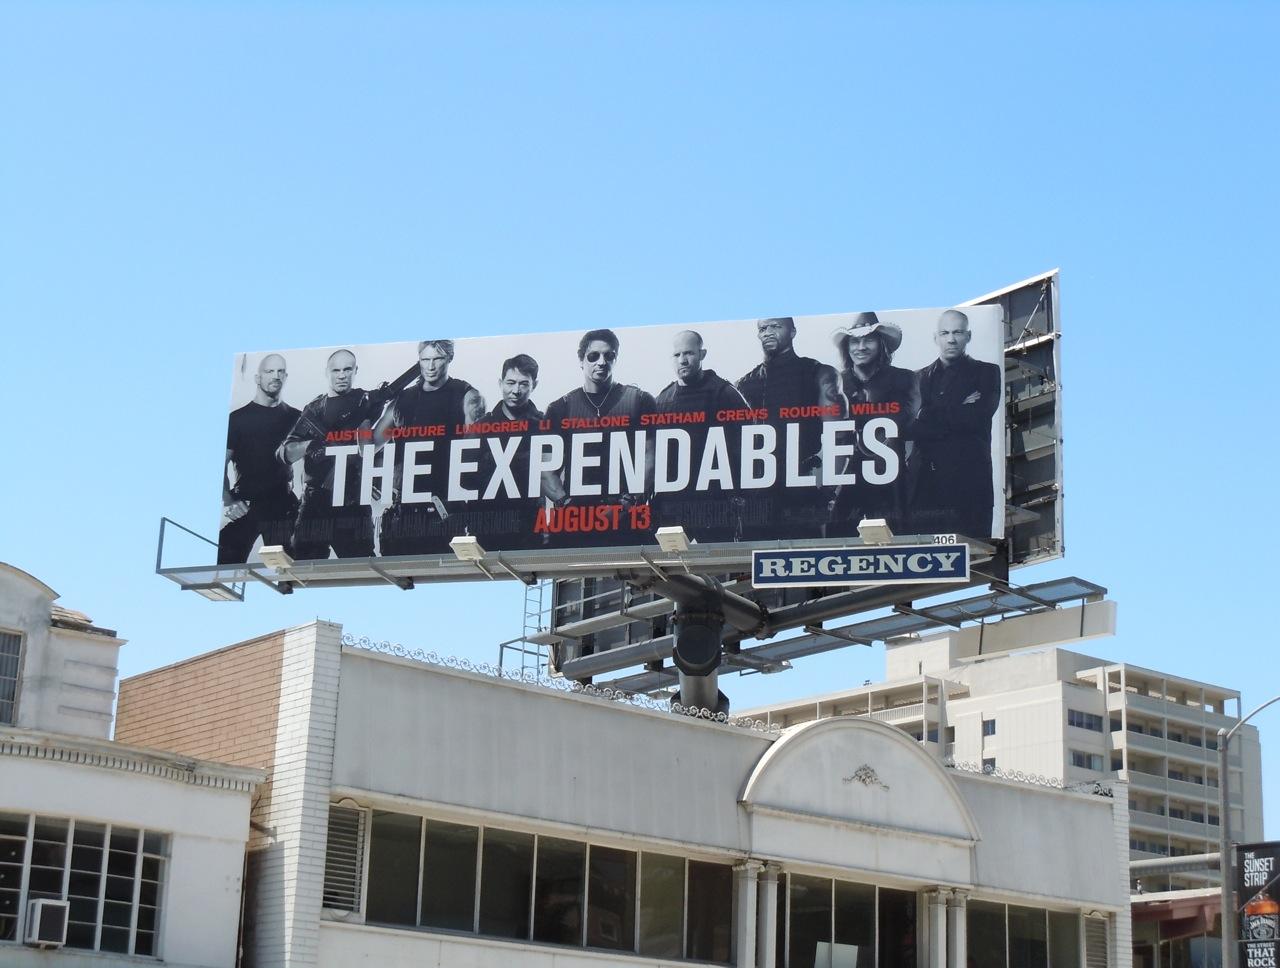 http://2.bp.blogspot.com/-z5W_OYE3Lxc/UBrZZIyNvcI/AAAAAAAAvJs/ZE7xzlPQFLQ/s1600/expendables+movie+billboard.jpg